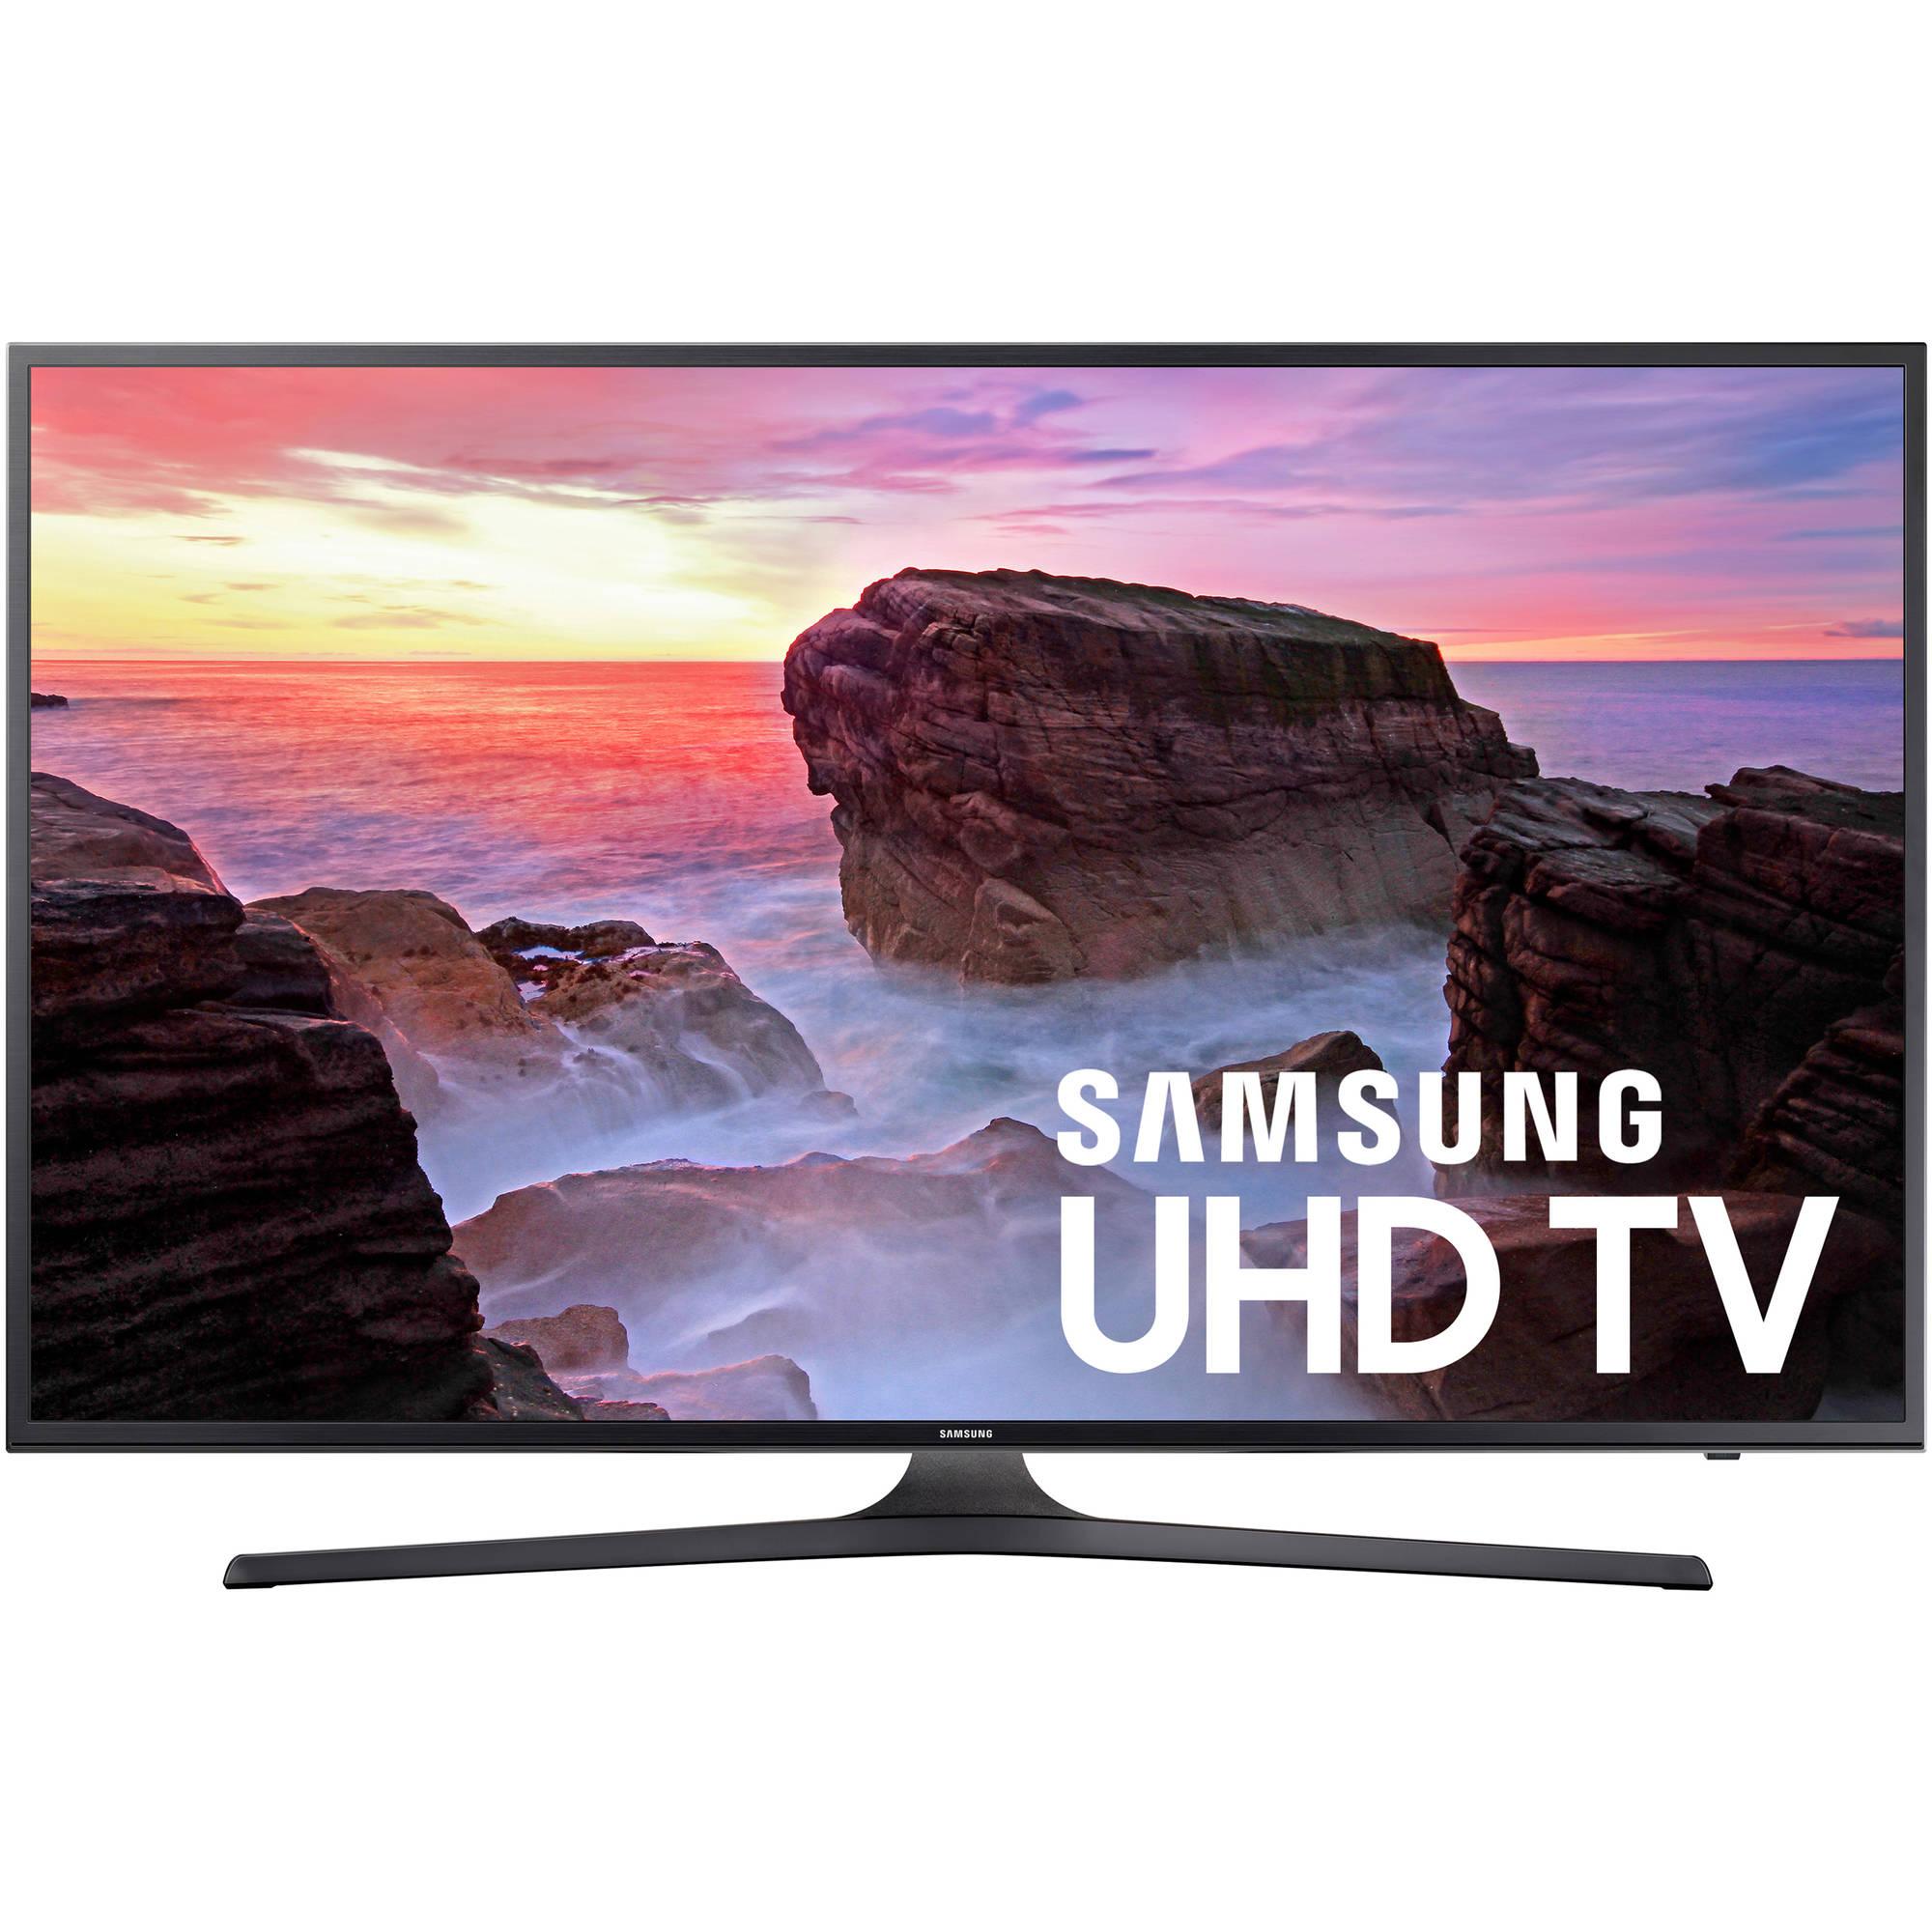 Samsung-65-034-Class-4K-2160P-Smart-LED-TV-UN65MU6300FXZA